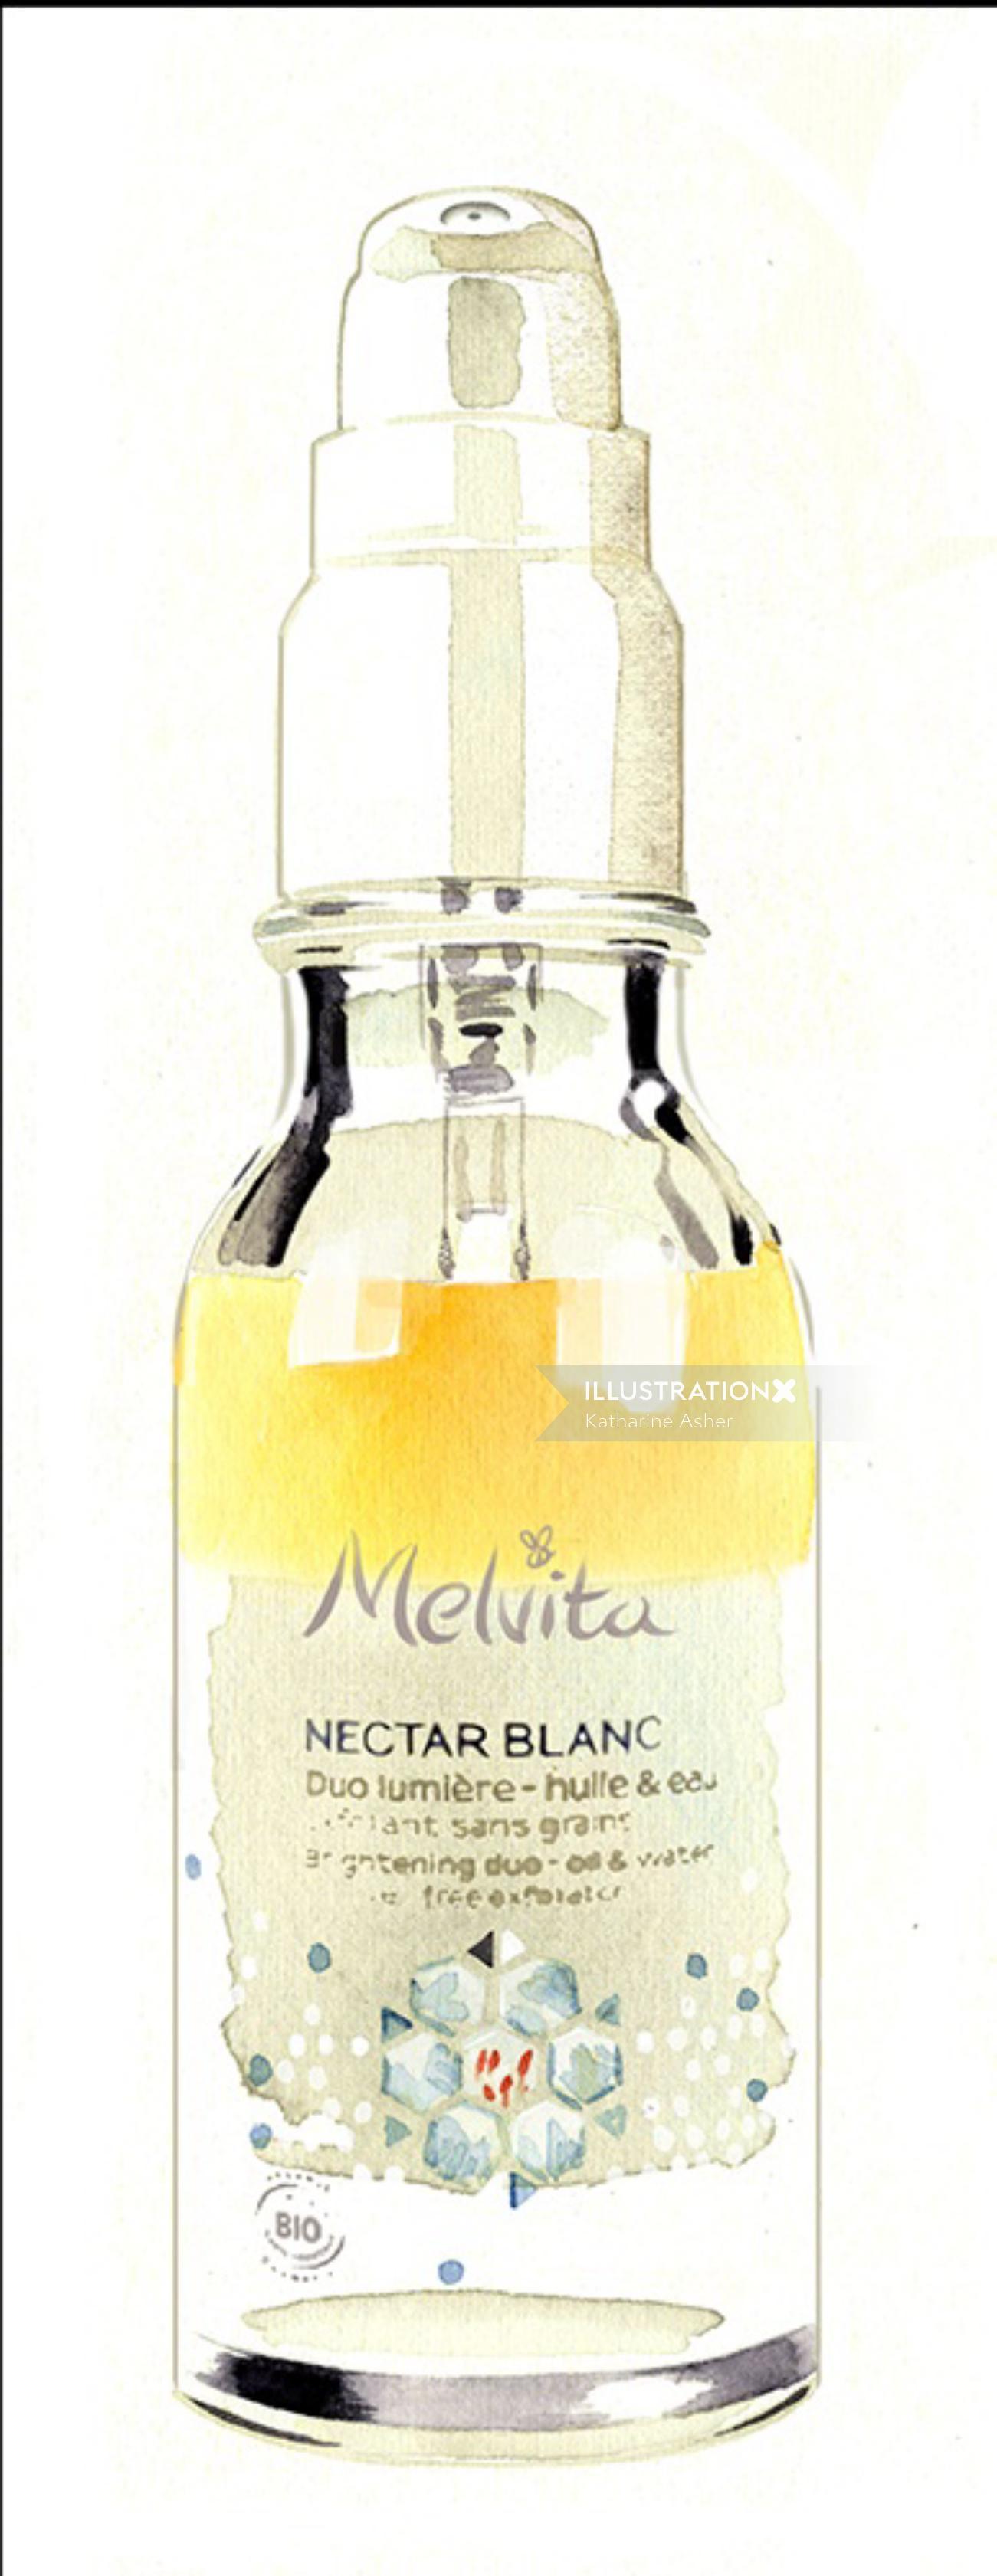 Melvita - Nectar Blanc packaging